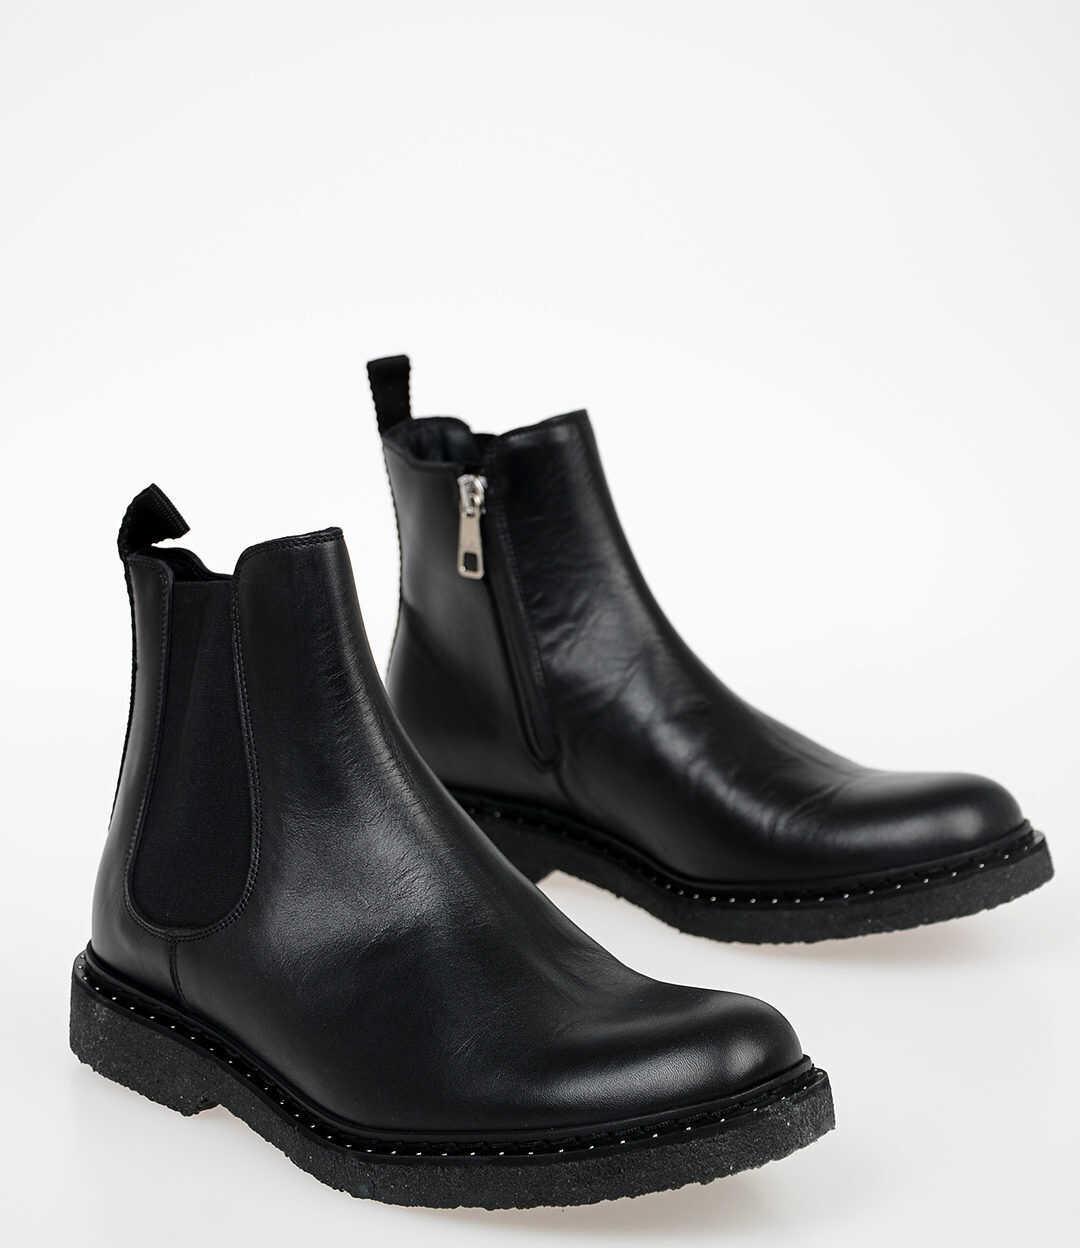 Neil Barrett Leather STUDDED CHELSEA Ankle Boots BLACK